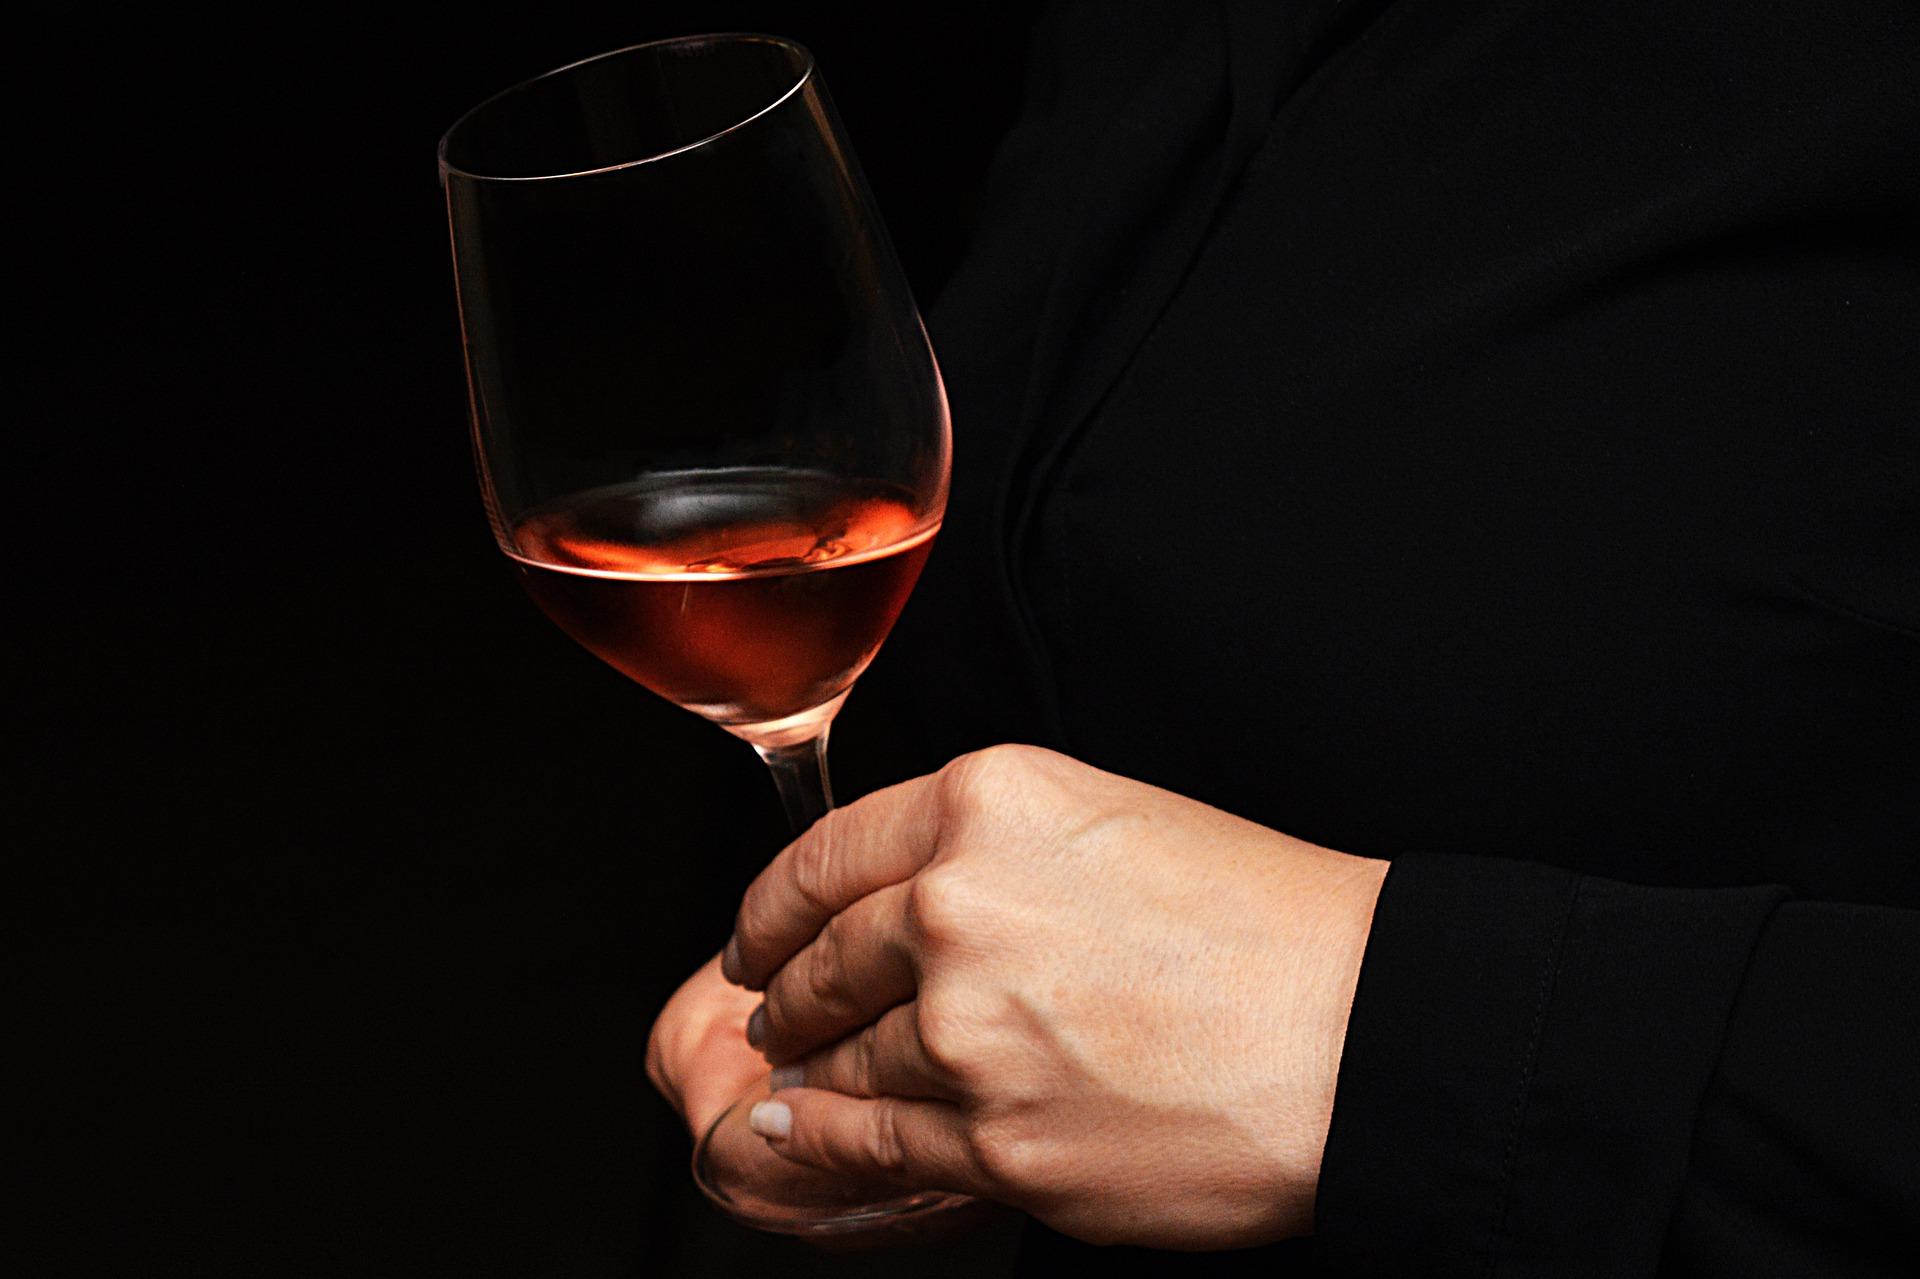 wine-4217859_1920.jpg